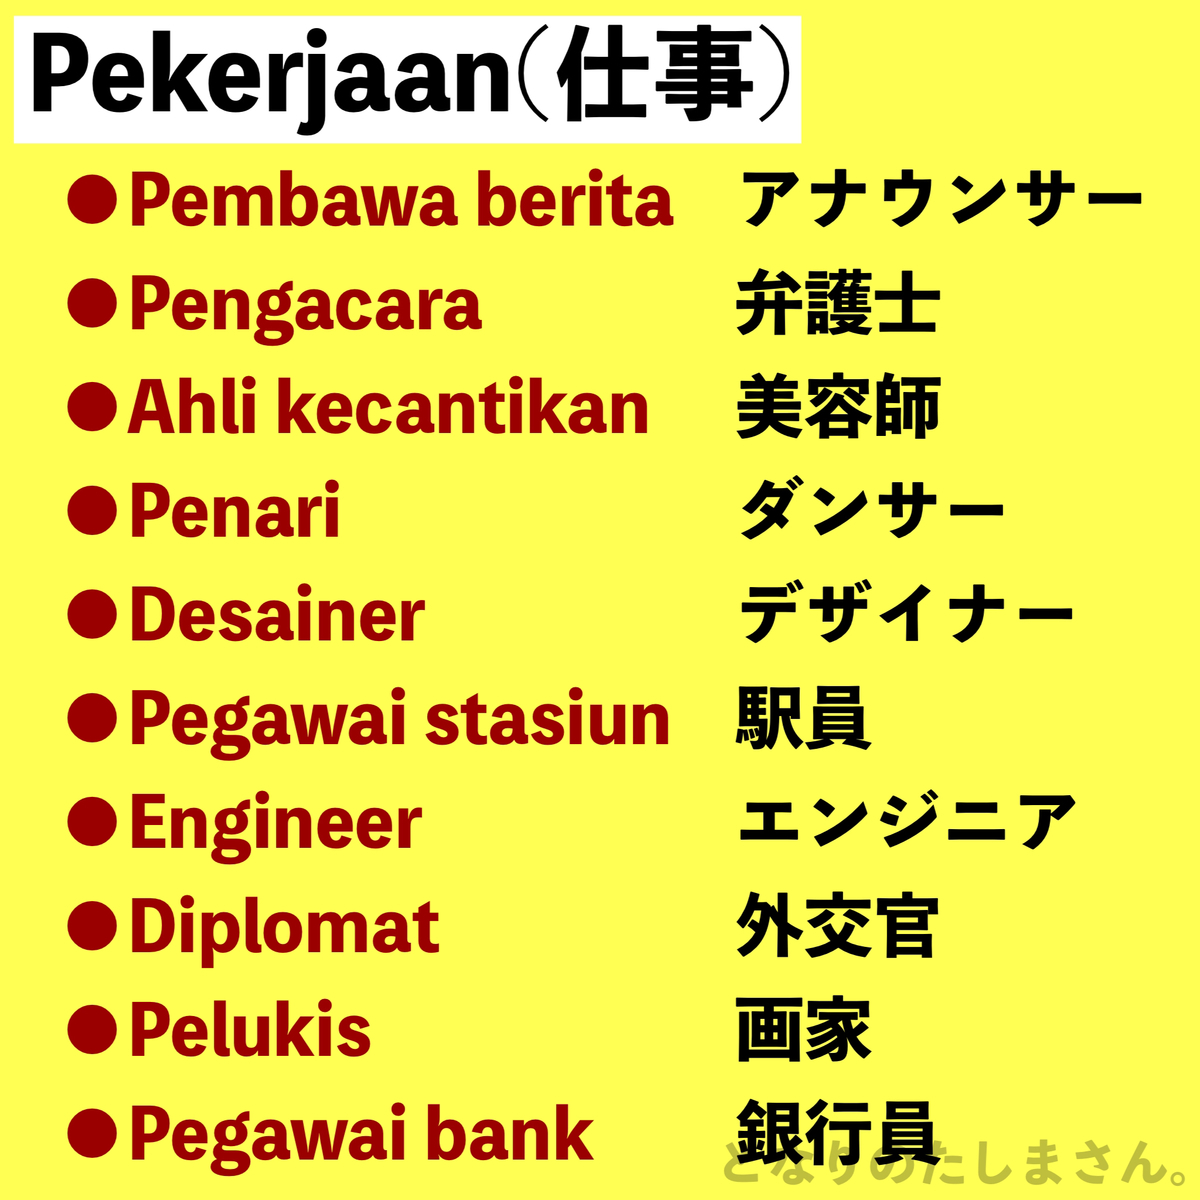 f:id:yutonsmaile:20210917123605j:plain